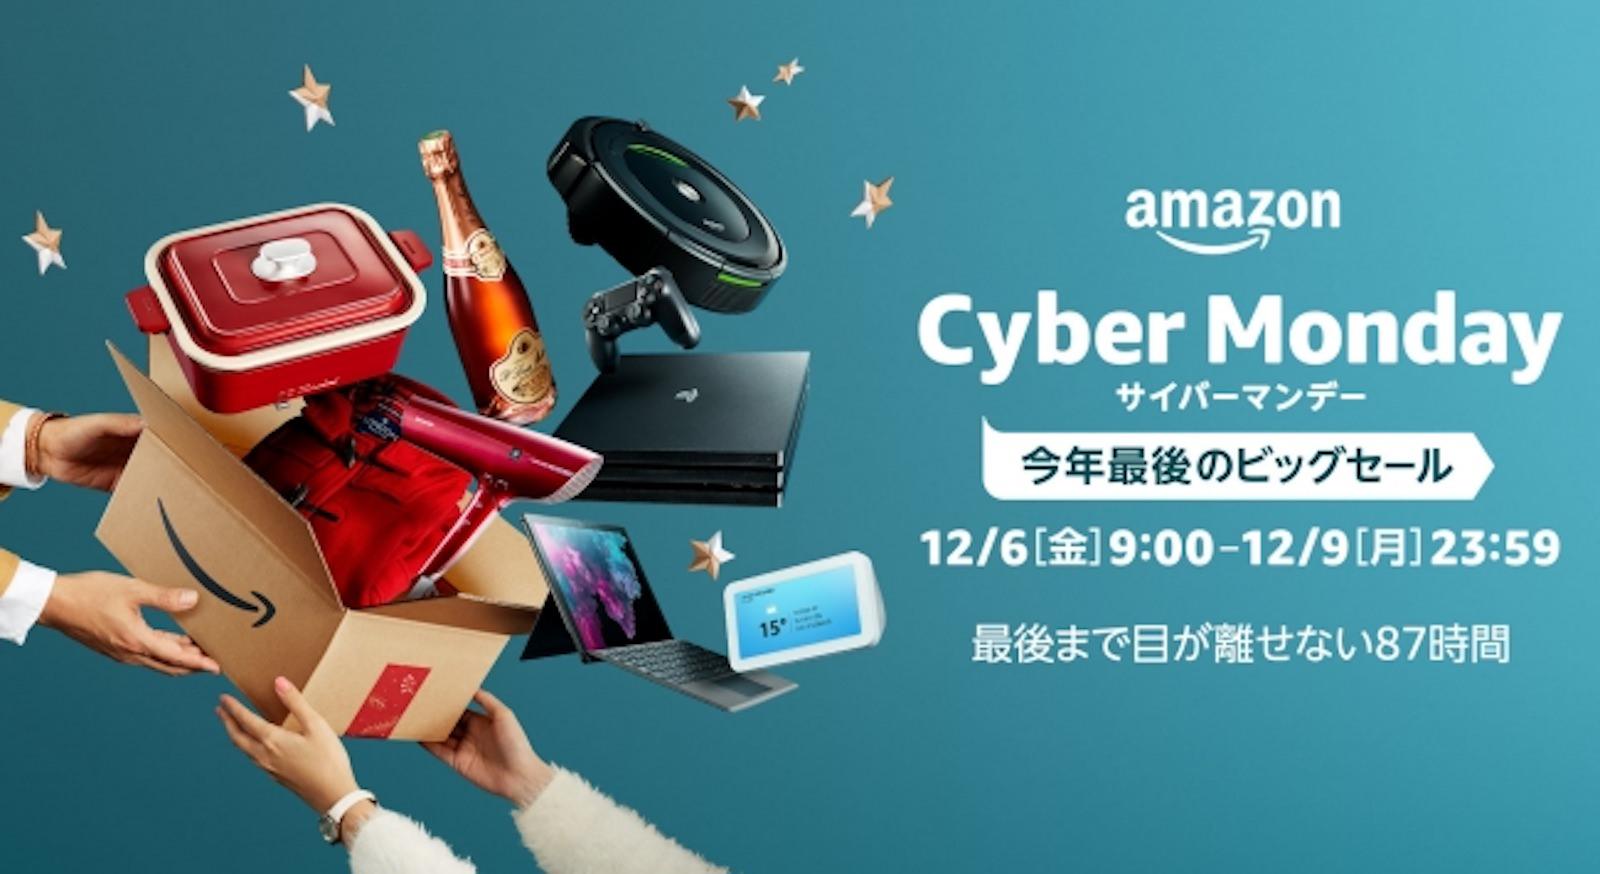 CyberMonday Sale